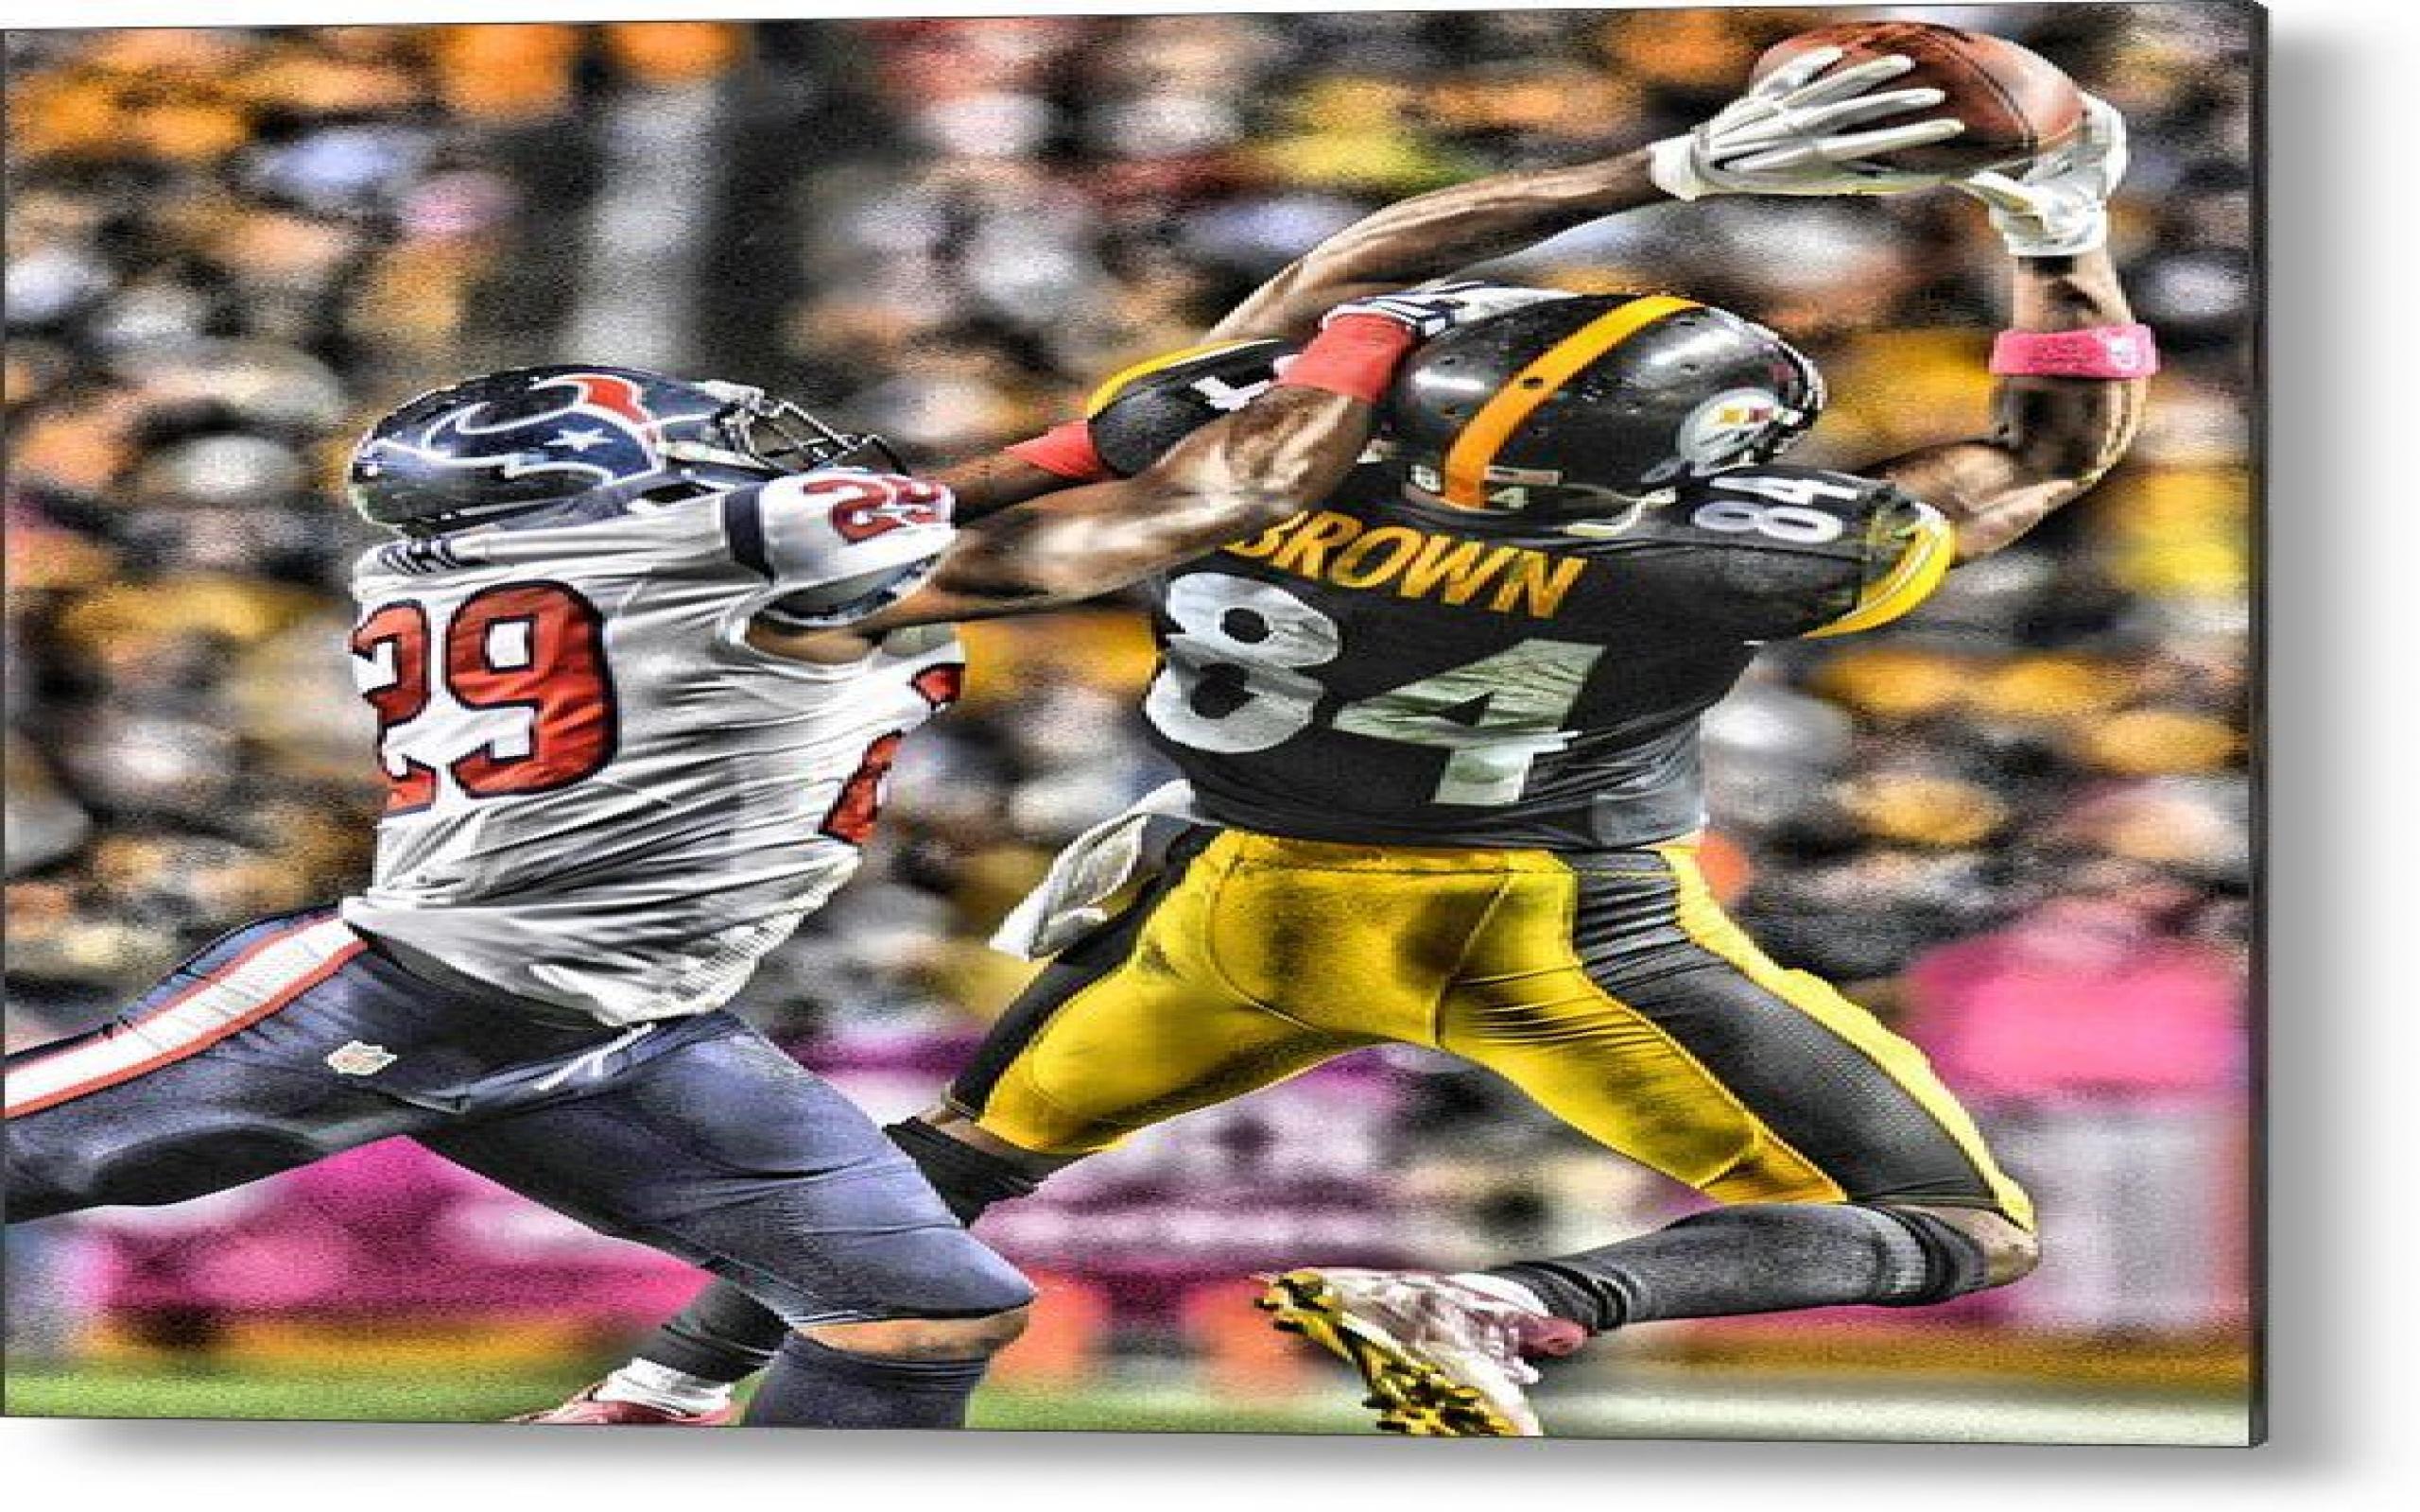 Antonio Brown Wallpaper - Kick American Football , HD Wallpaper & Backgrounds